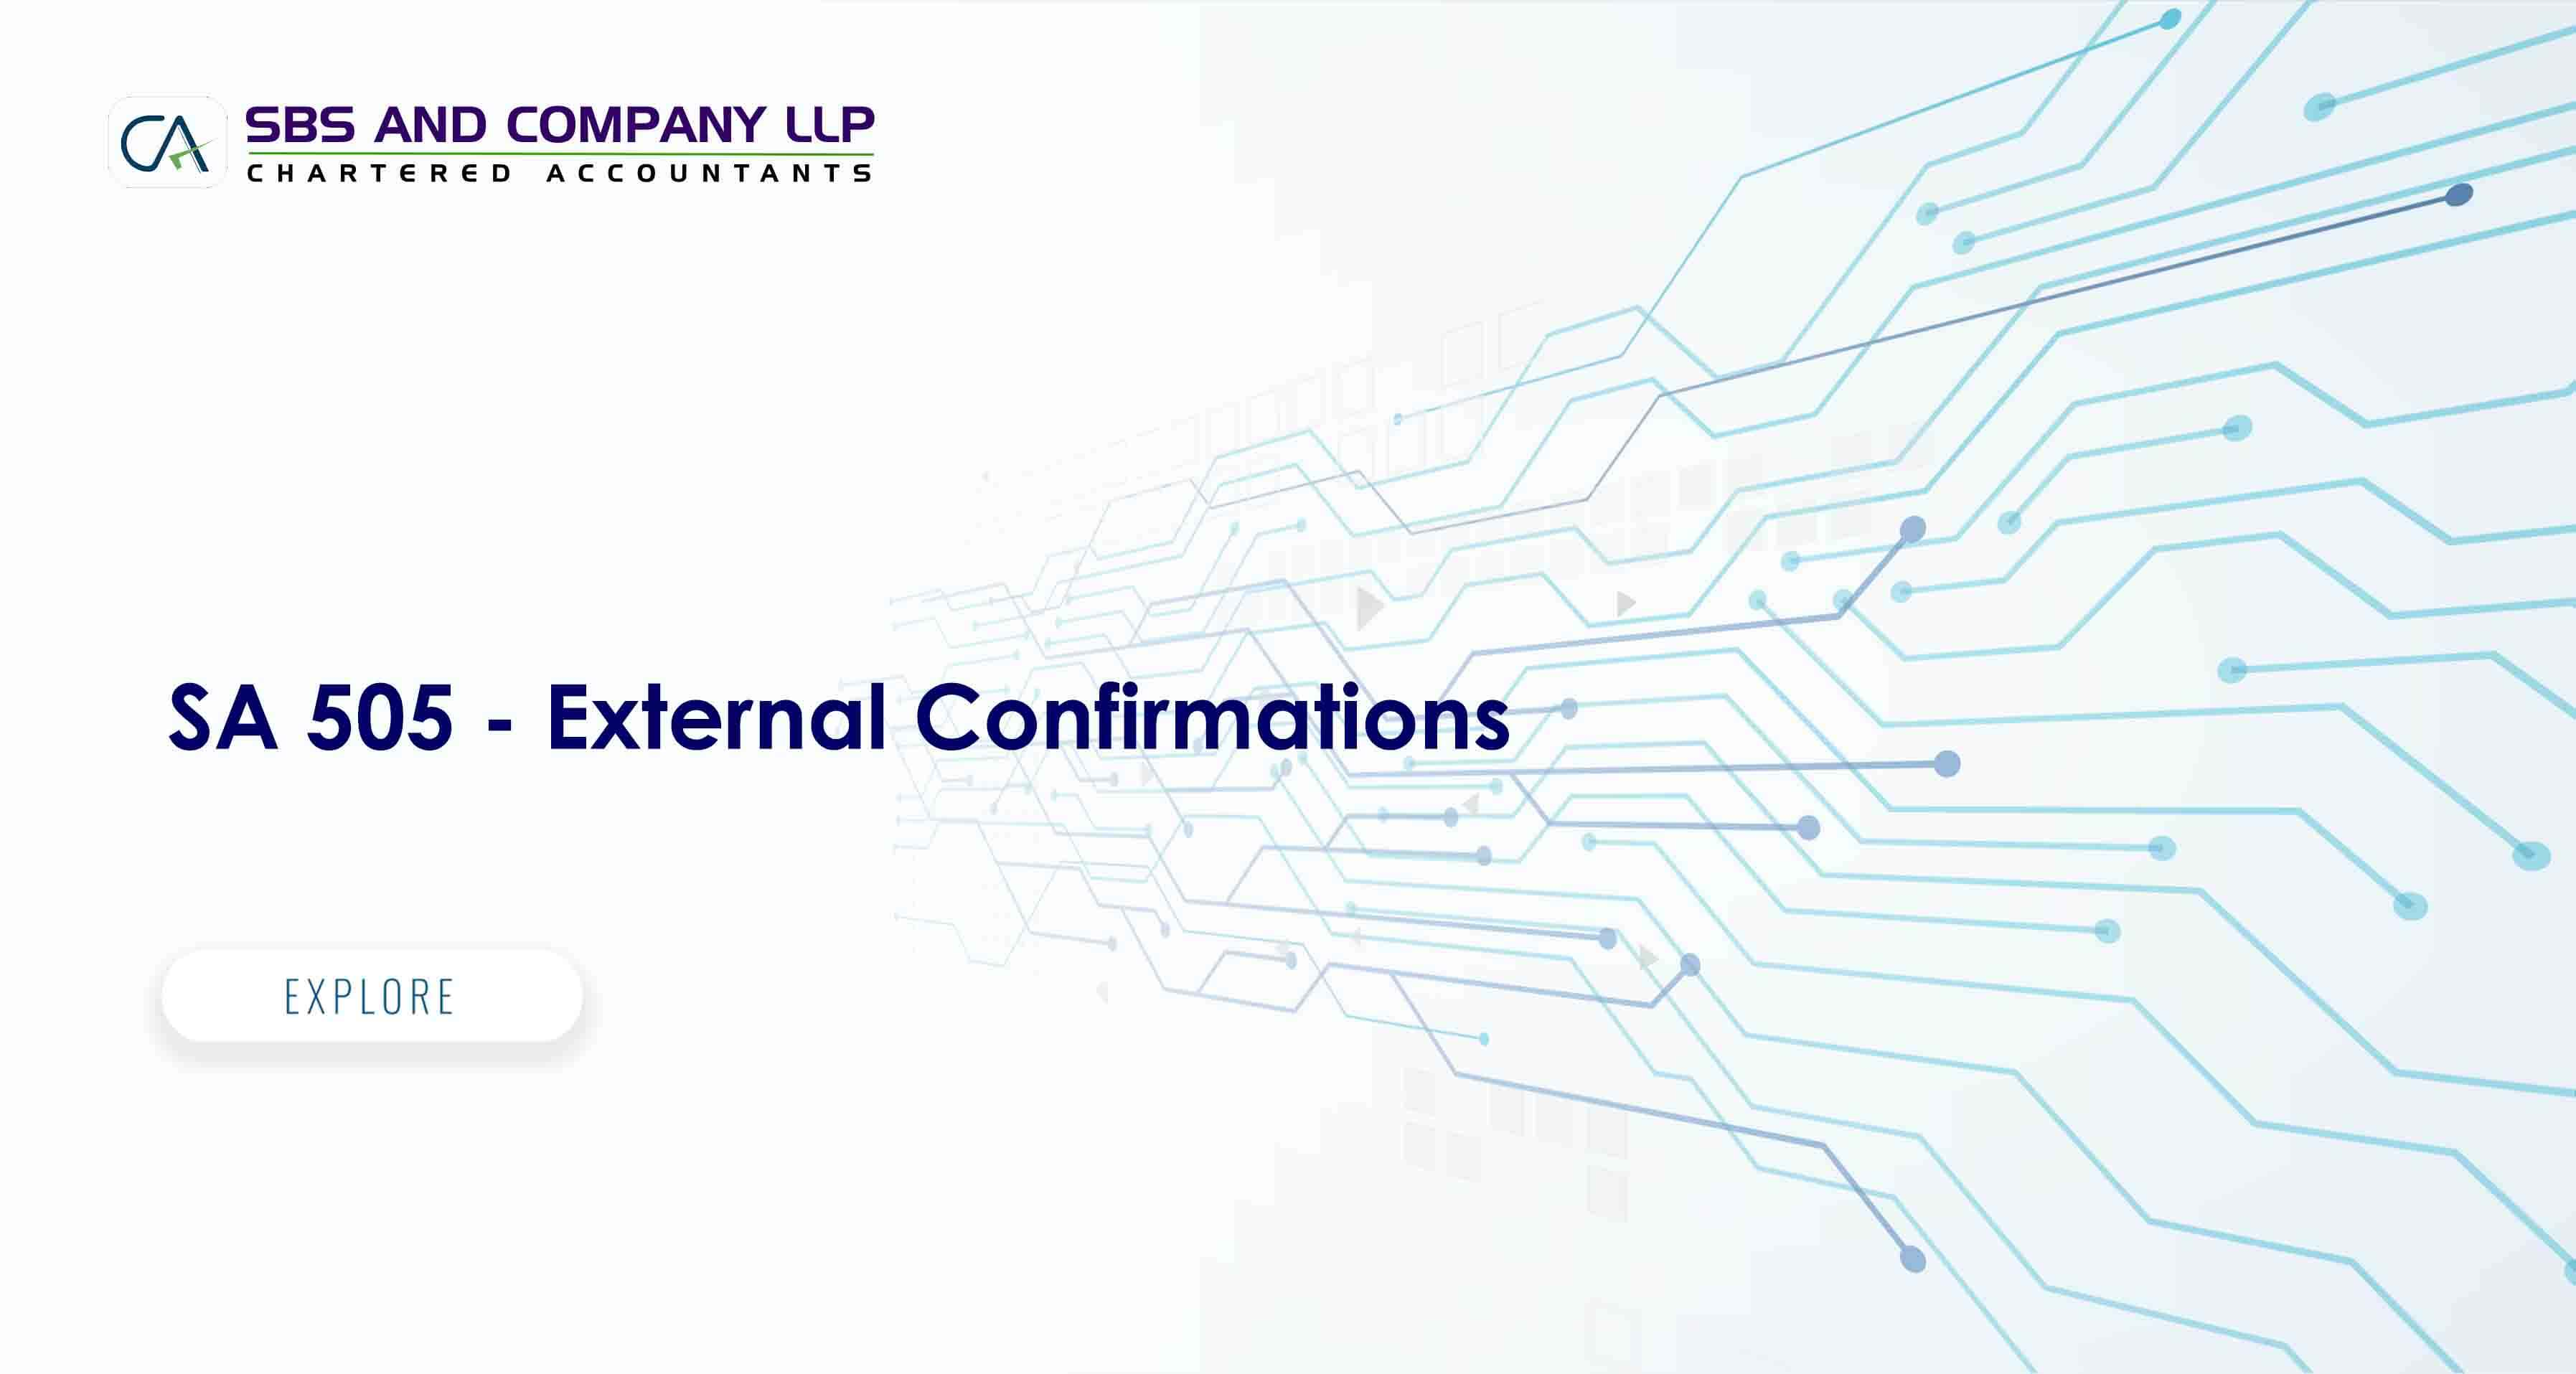 Sa 505 External Confirmations